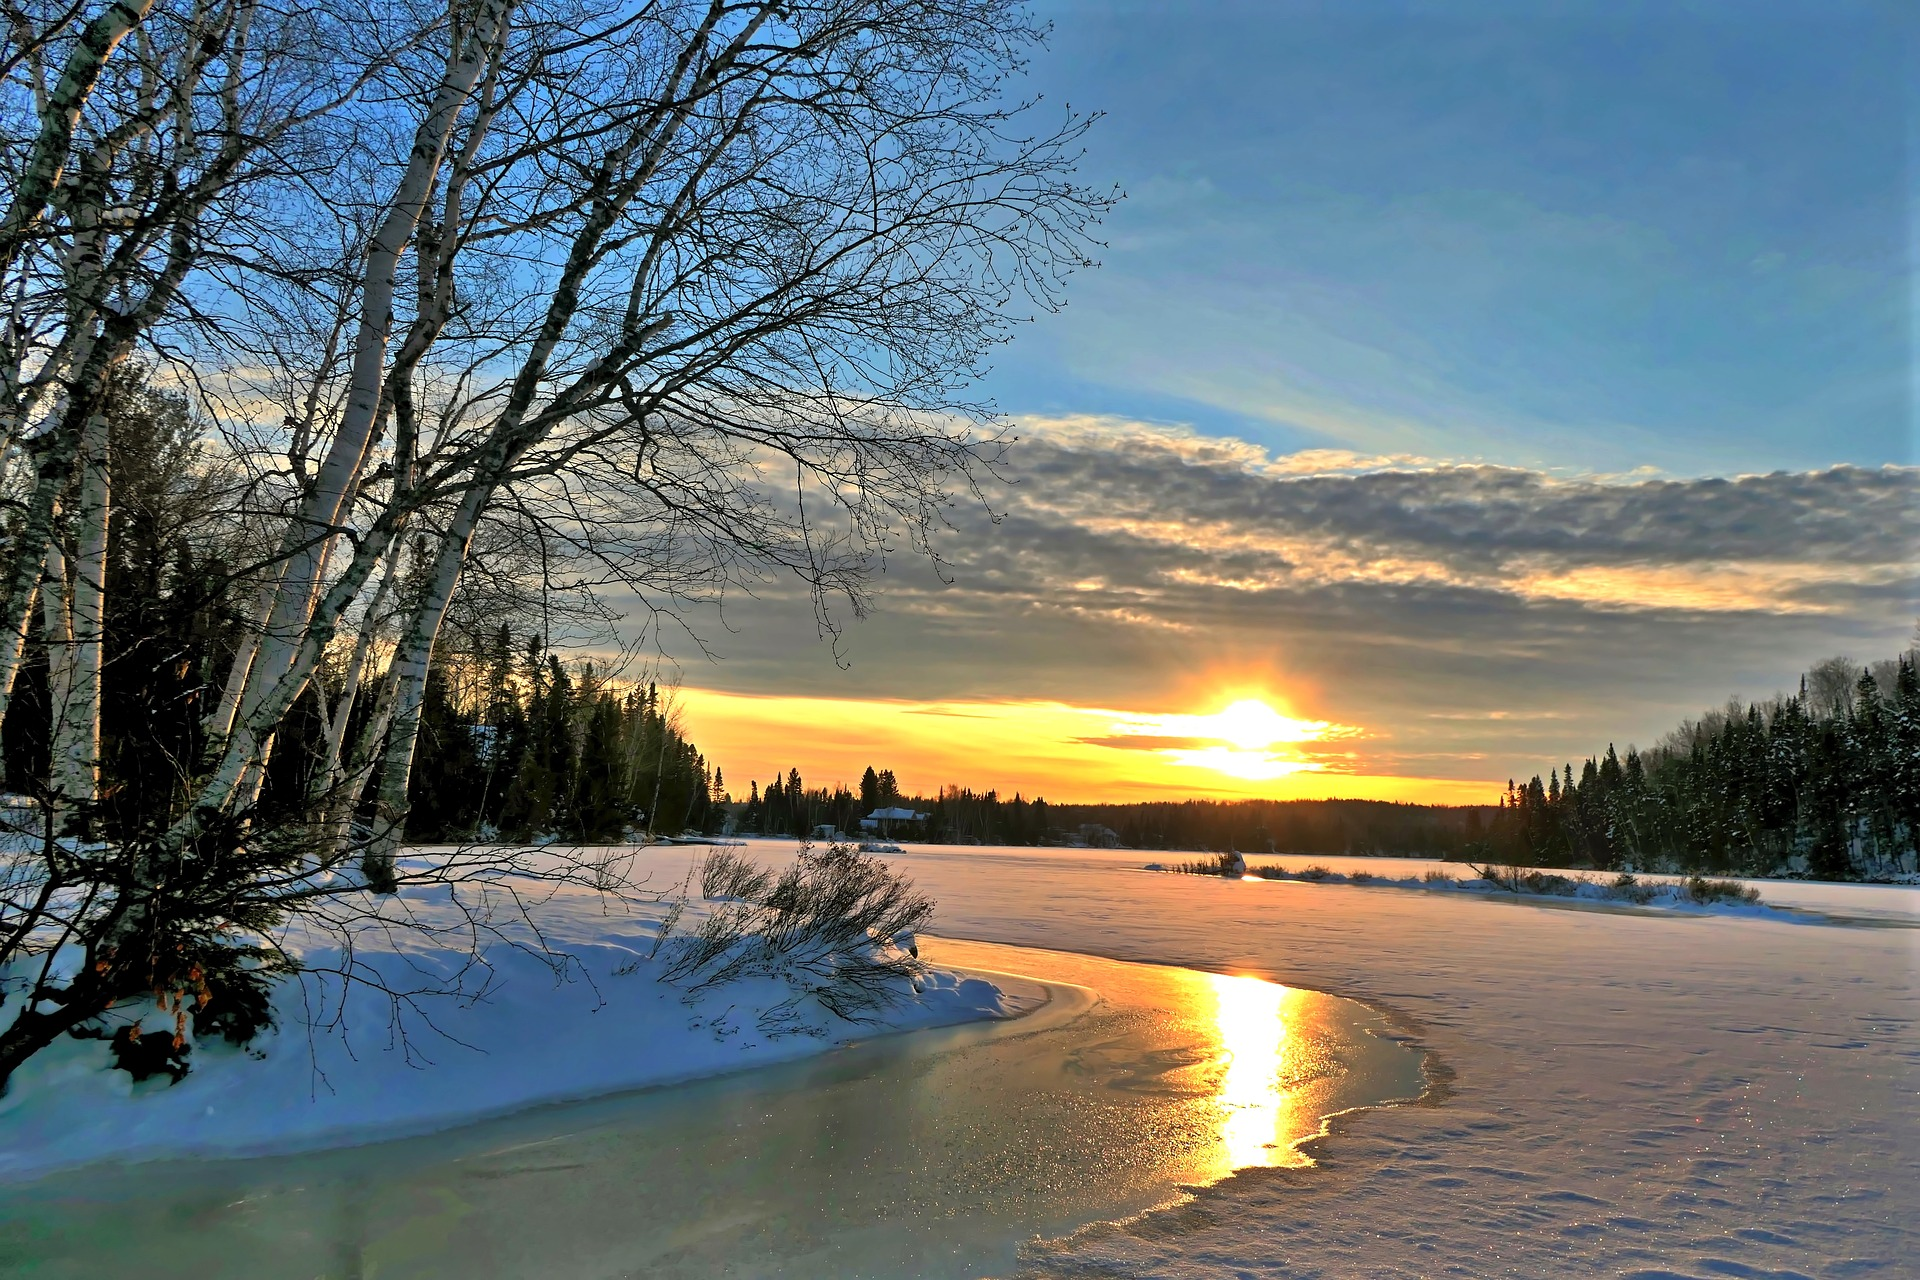 sunset-3871163_1920.jpg